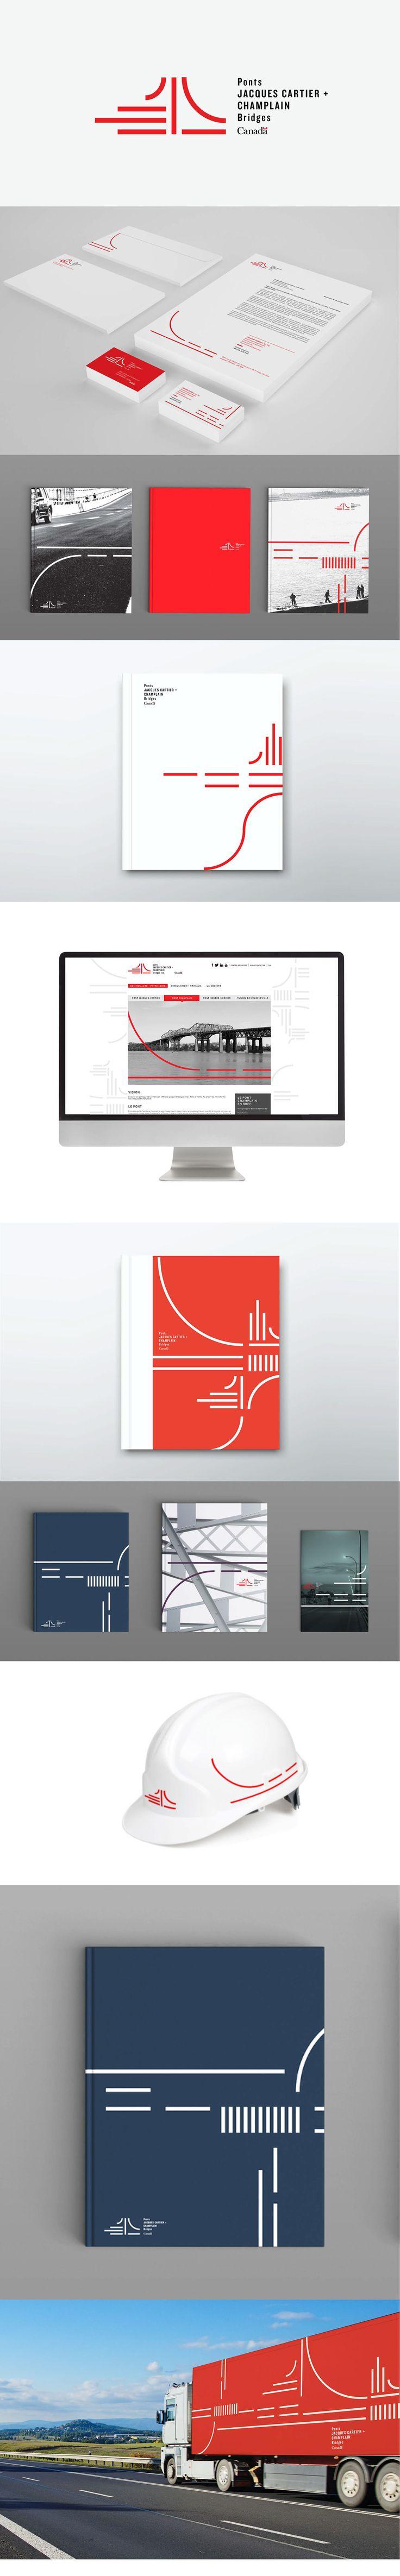 "Check out this @Behance project: ""Jacques Cartier and Champlain Bridges Inc. Rebranding"" https://www.behance.net/gallery/40944739/Jacques-Cartier-and-Champlain-Bridges-Inc-Rebranding"